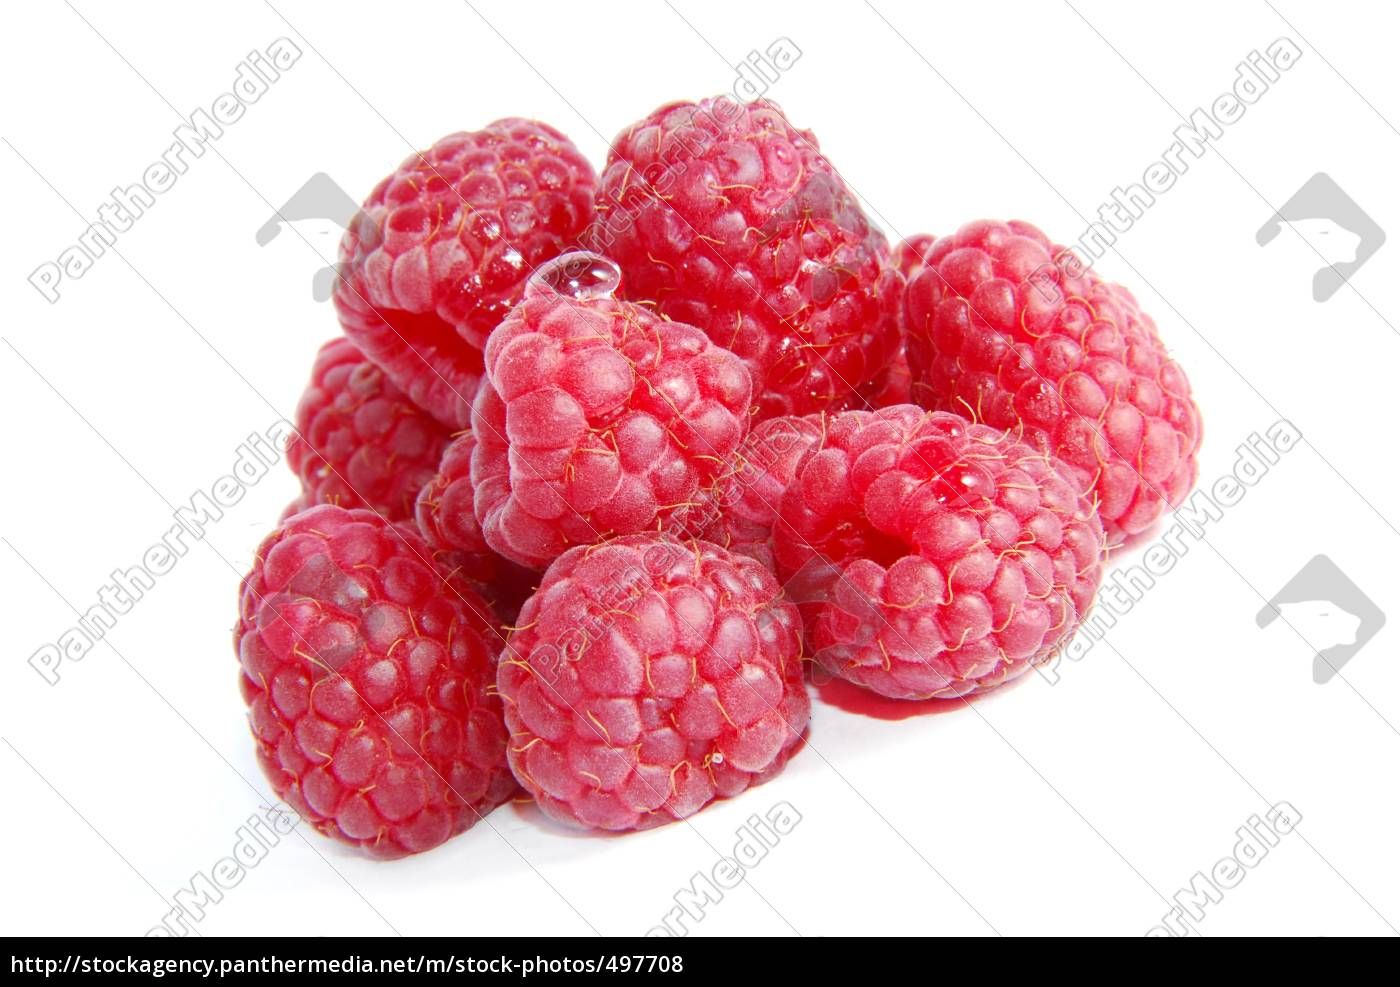 raspberries - 497708